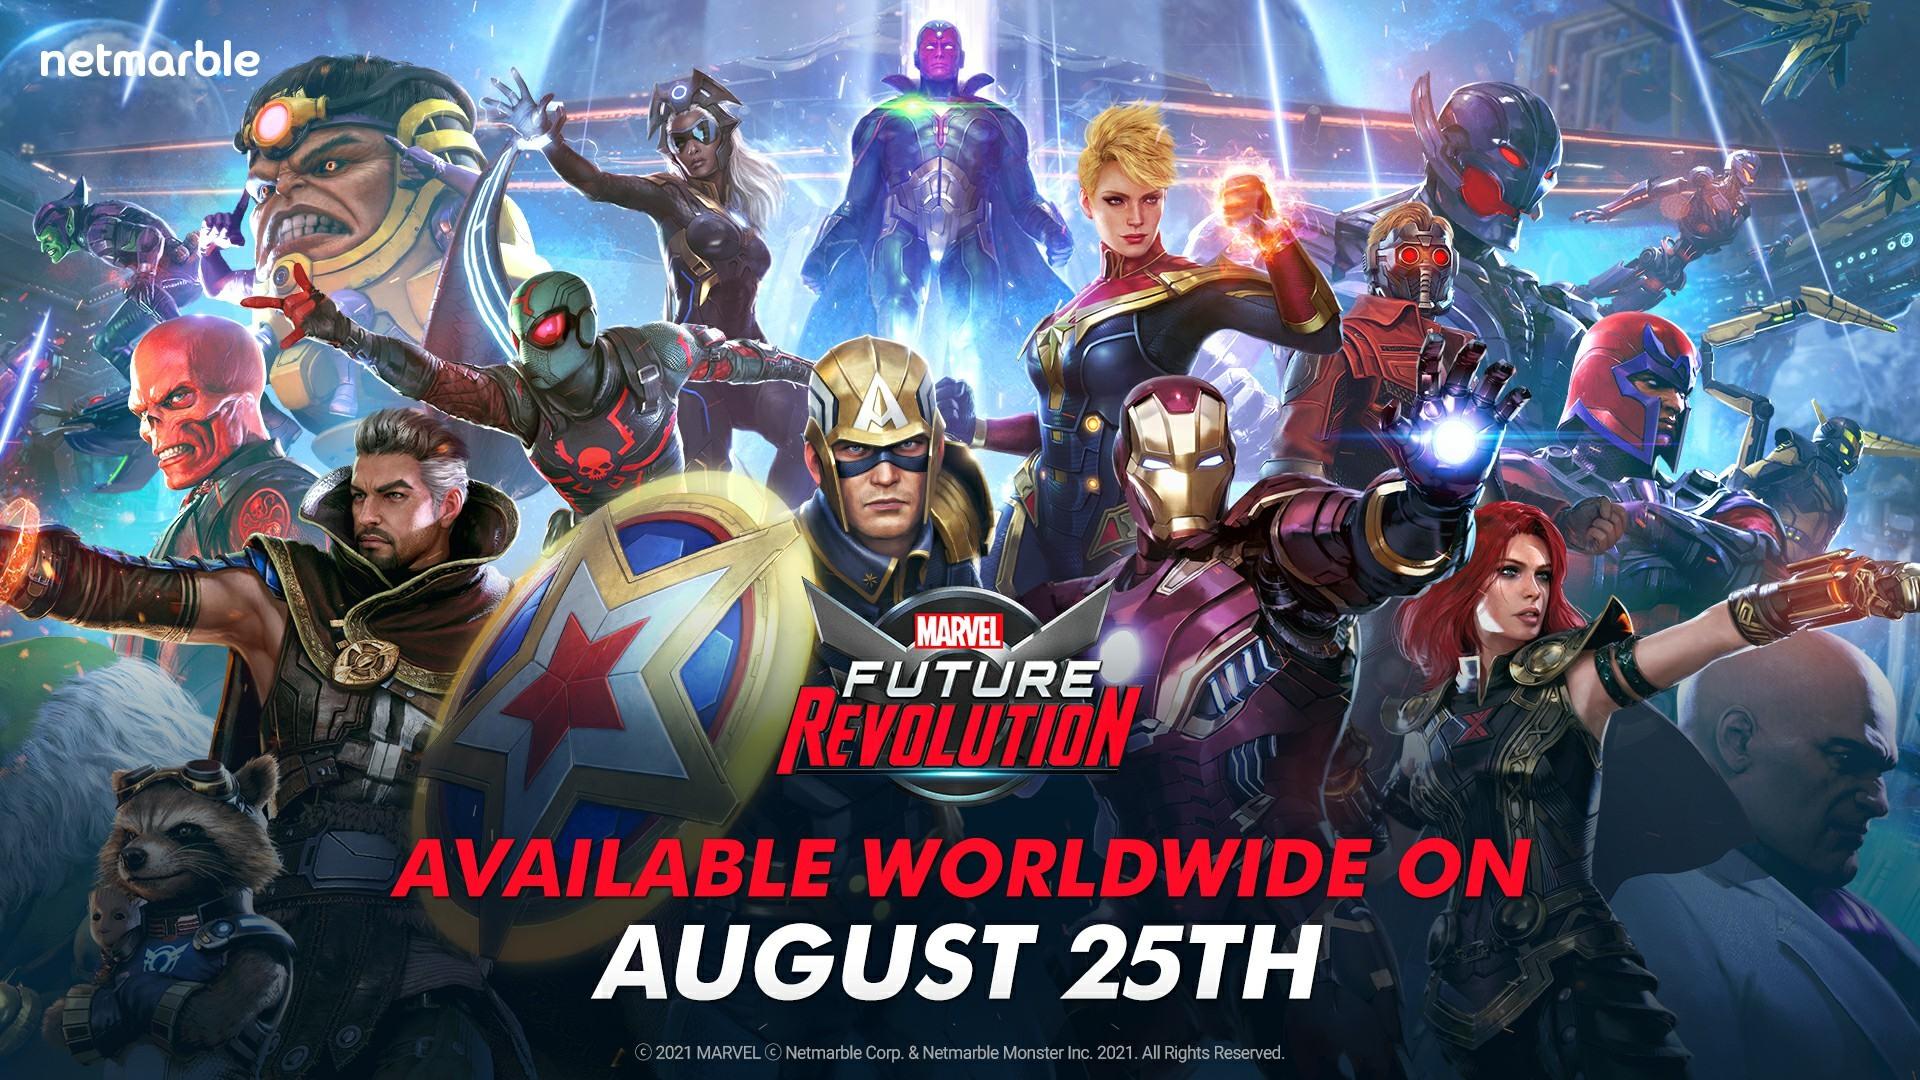 《MARVEL 未來革命》宣布將於 8 月全球上市 並肩作戰抵禦超級反派的襲擊